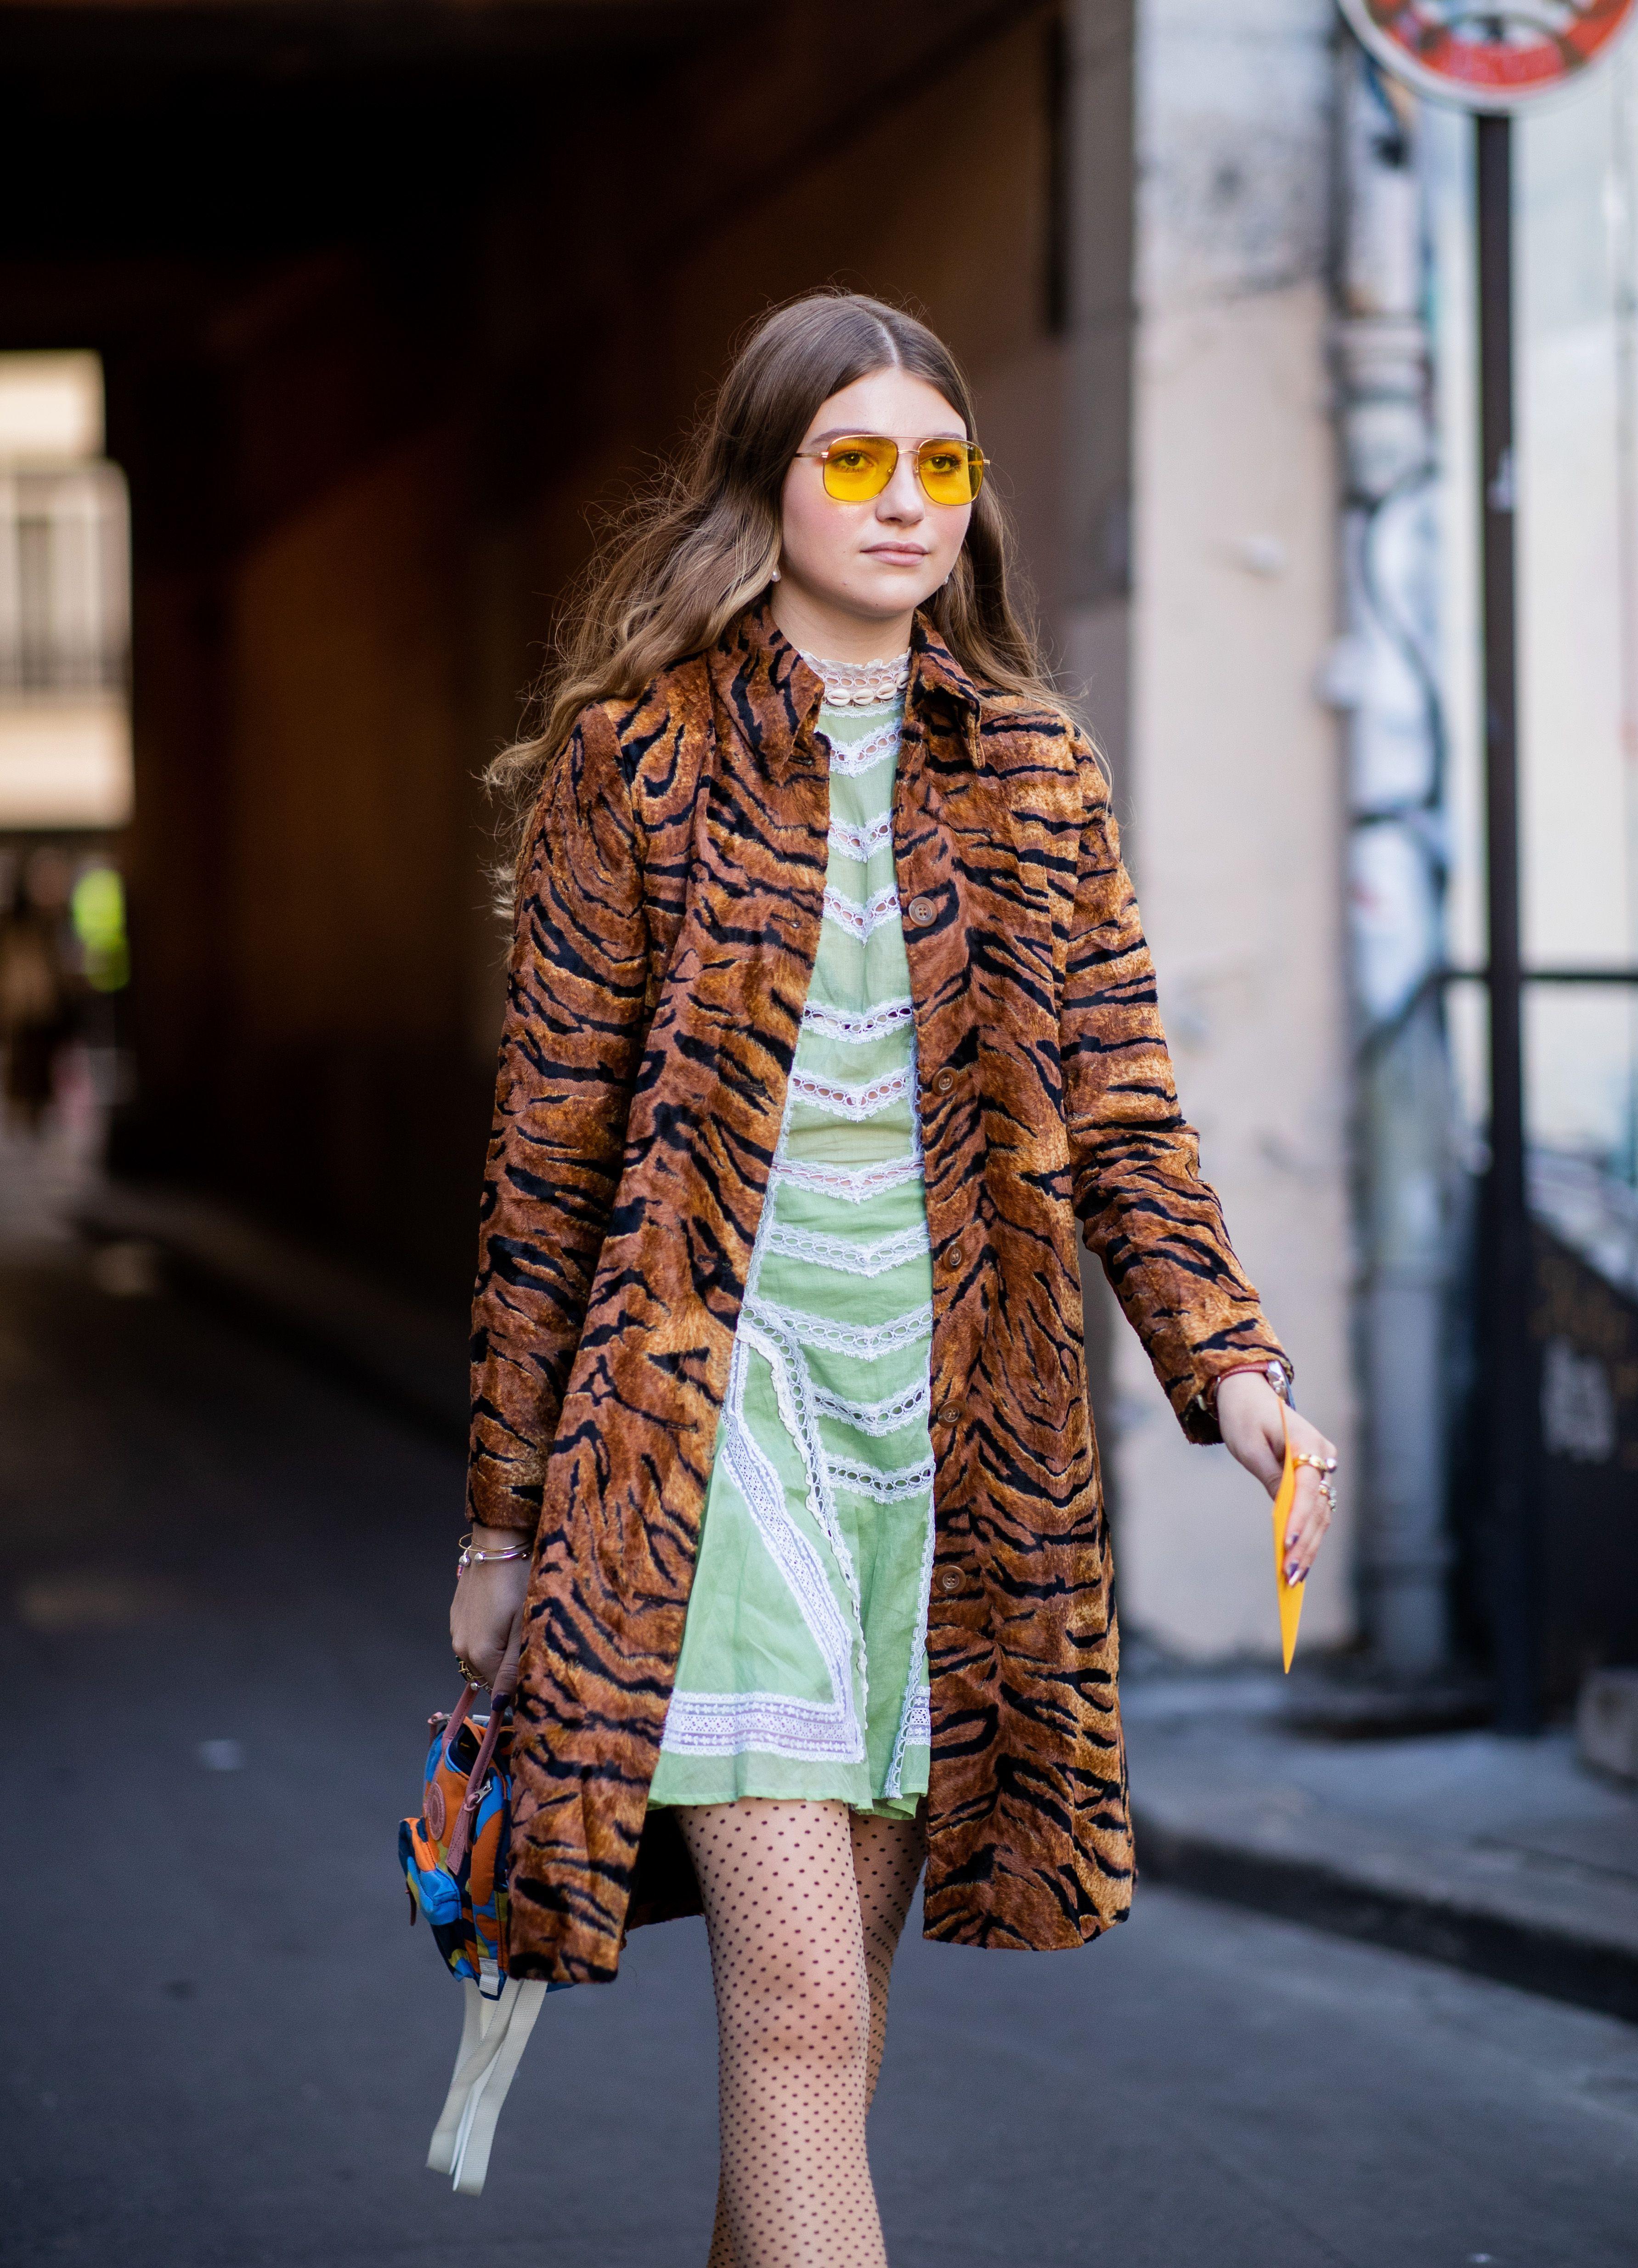 tiger-print-jacket-street-style-1541011697.jpg (3566×4937)